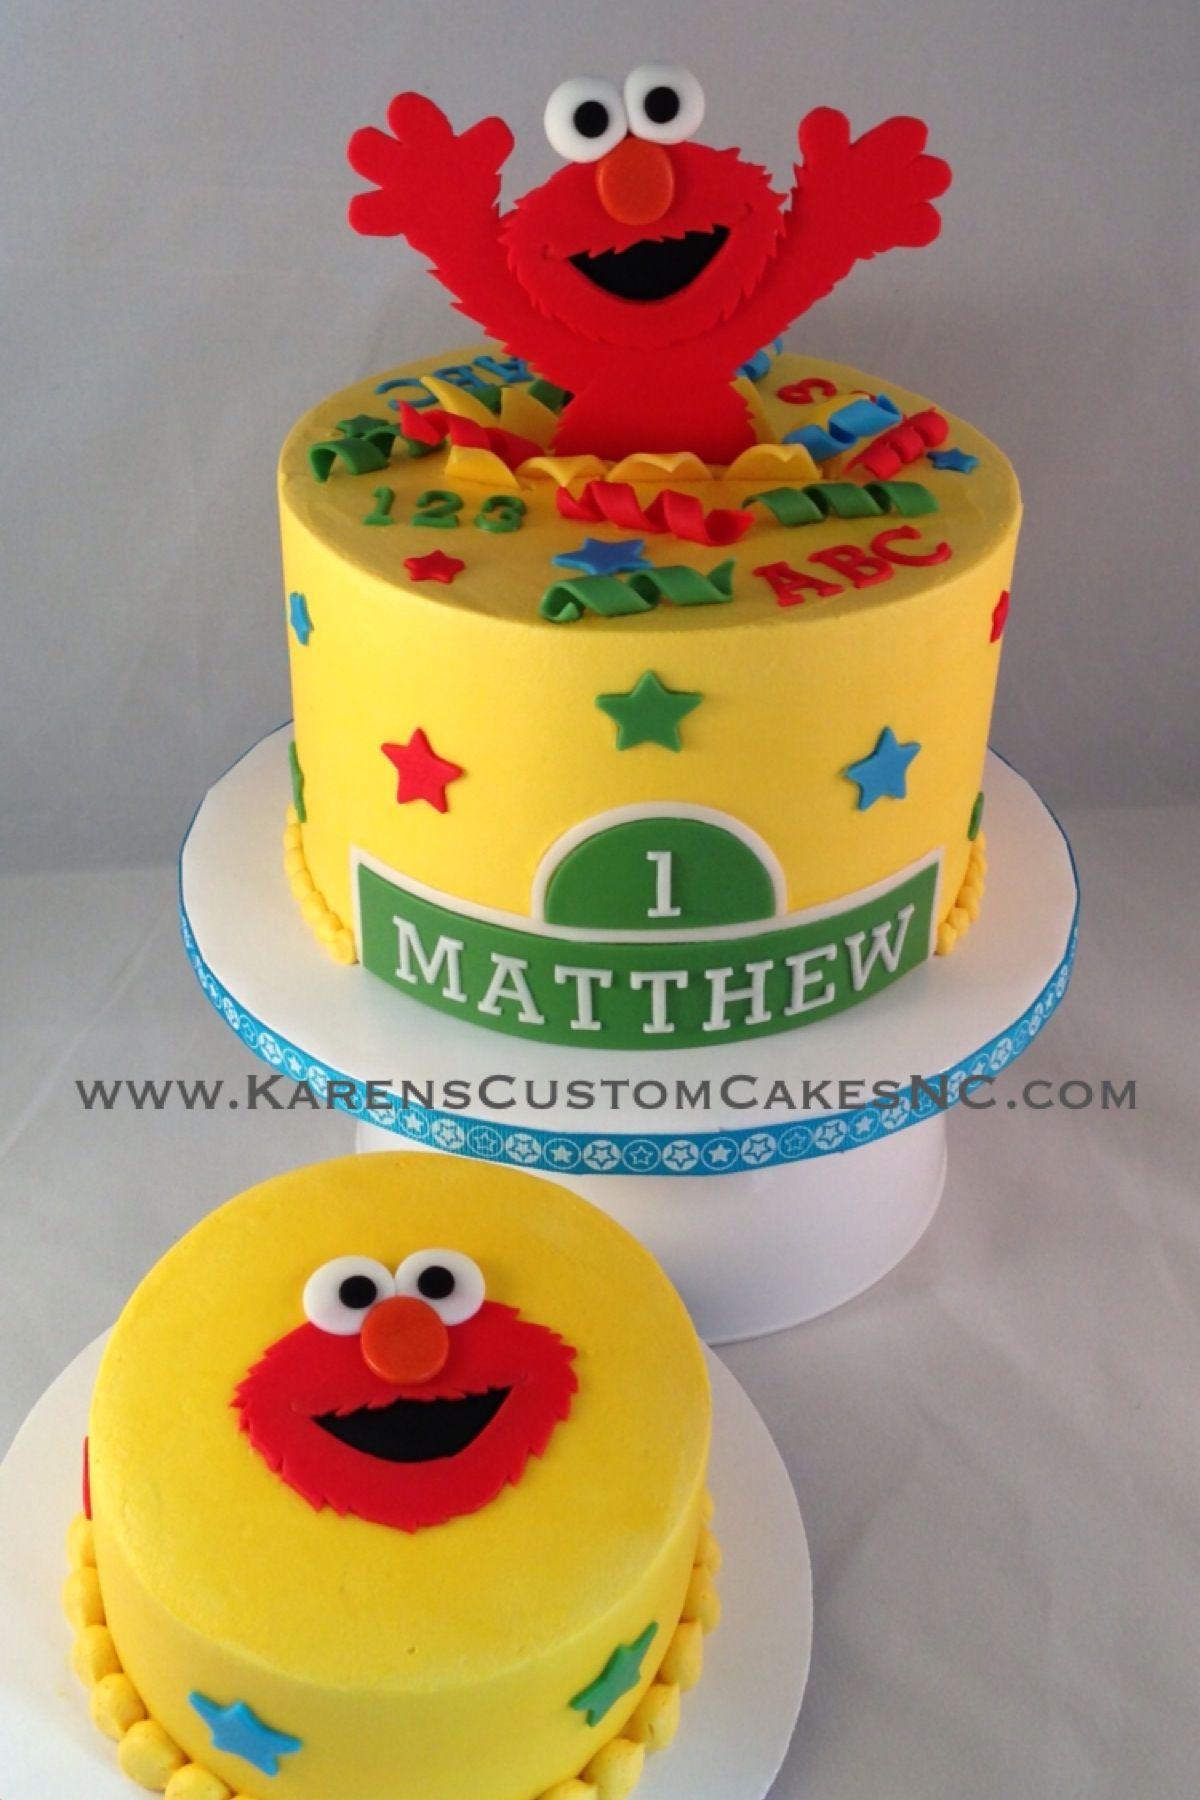 Outstanding A Little 6 Elmo Cake W Matching Smash Cake Buttercream W Fondant Personalised Birthday Cards Veneteletsinfo